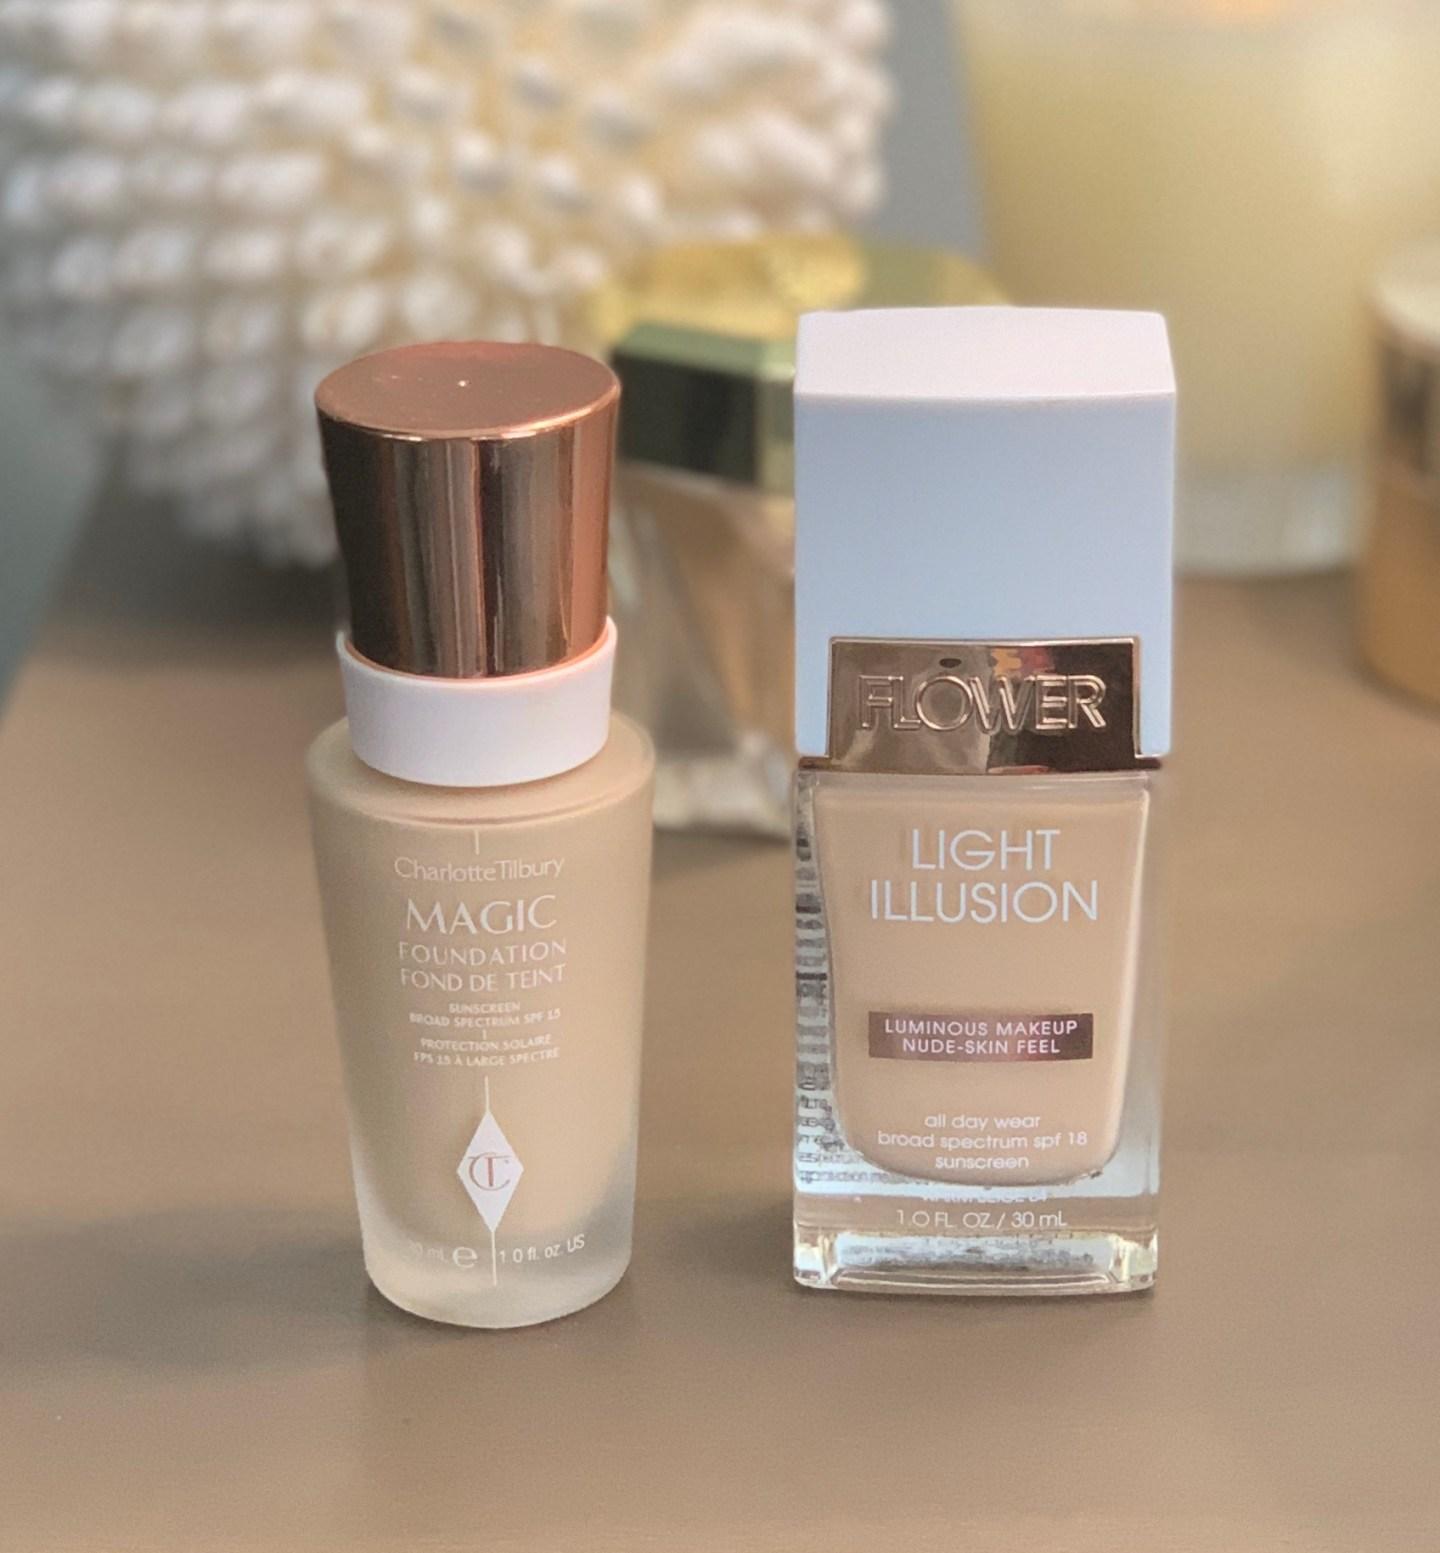 Charlotte Tilbury Magic Foundation vs Flower Beauty Light Illusion Drugstore Makeup Dupes